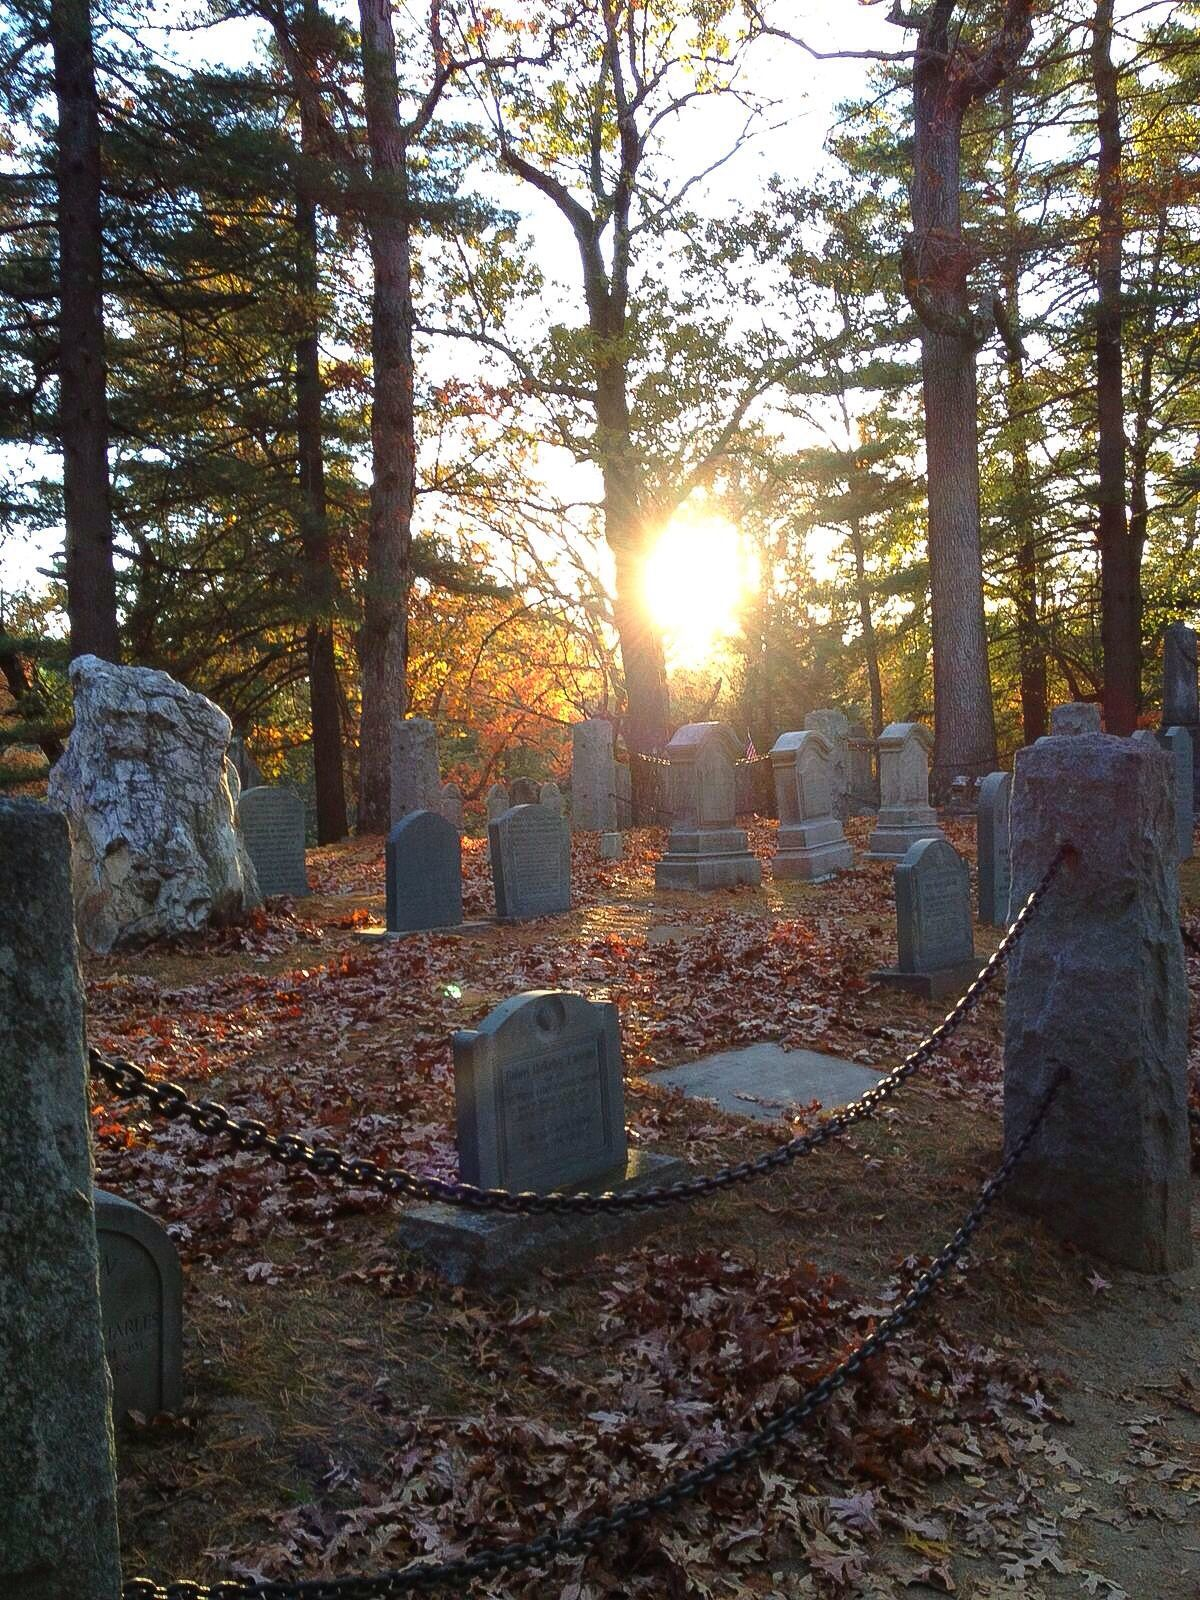 Sleepy Hollow Cemetery   Where Concords Legends Lie